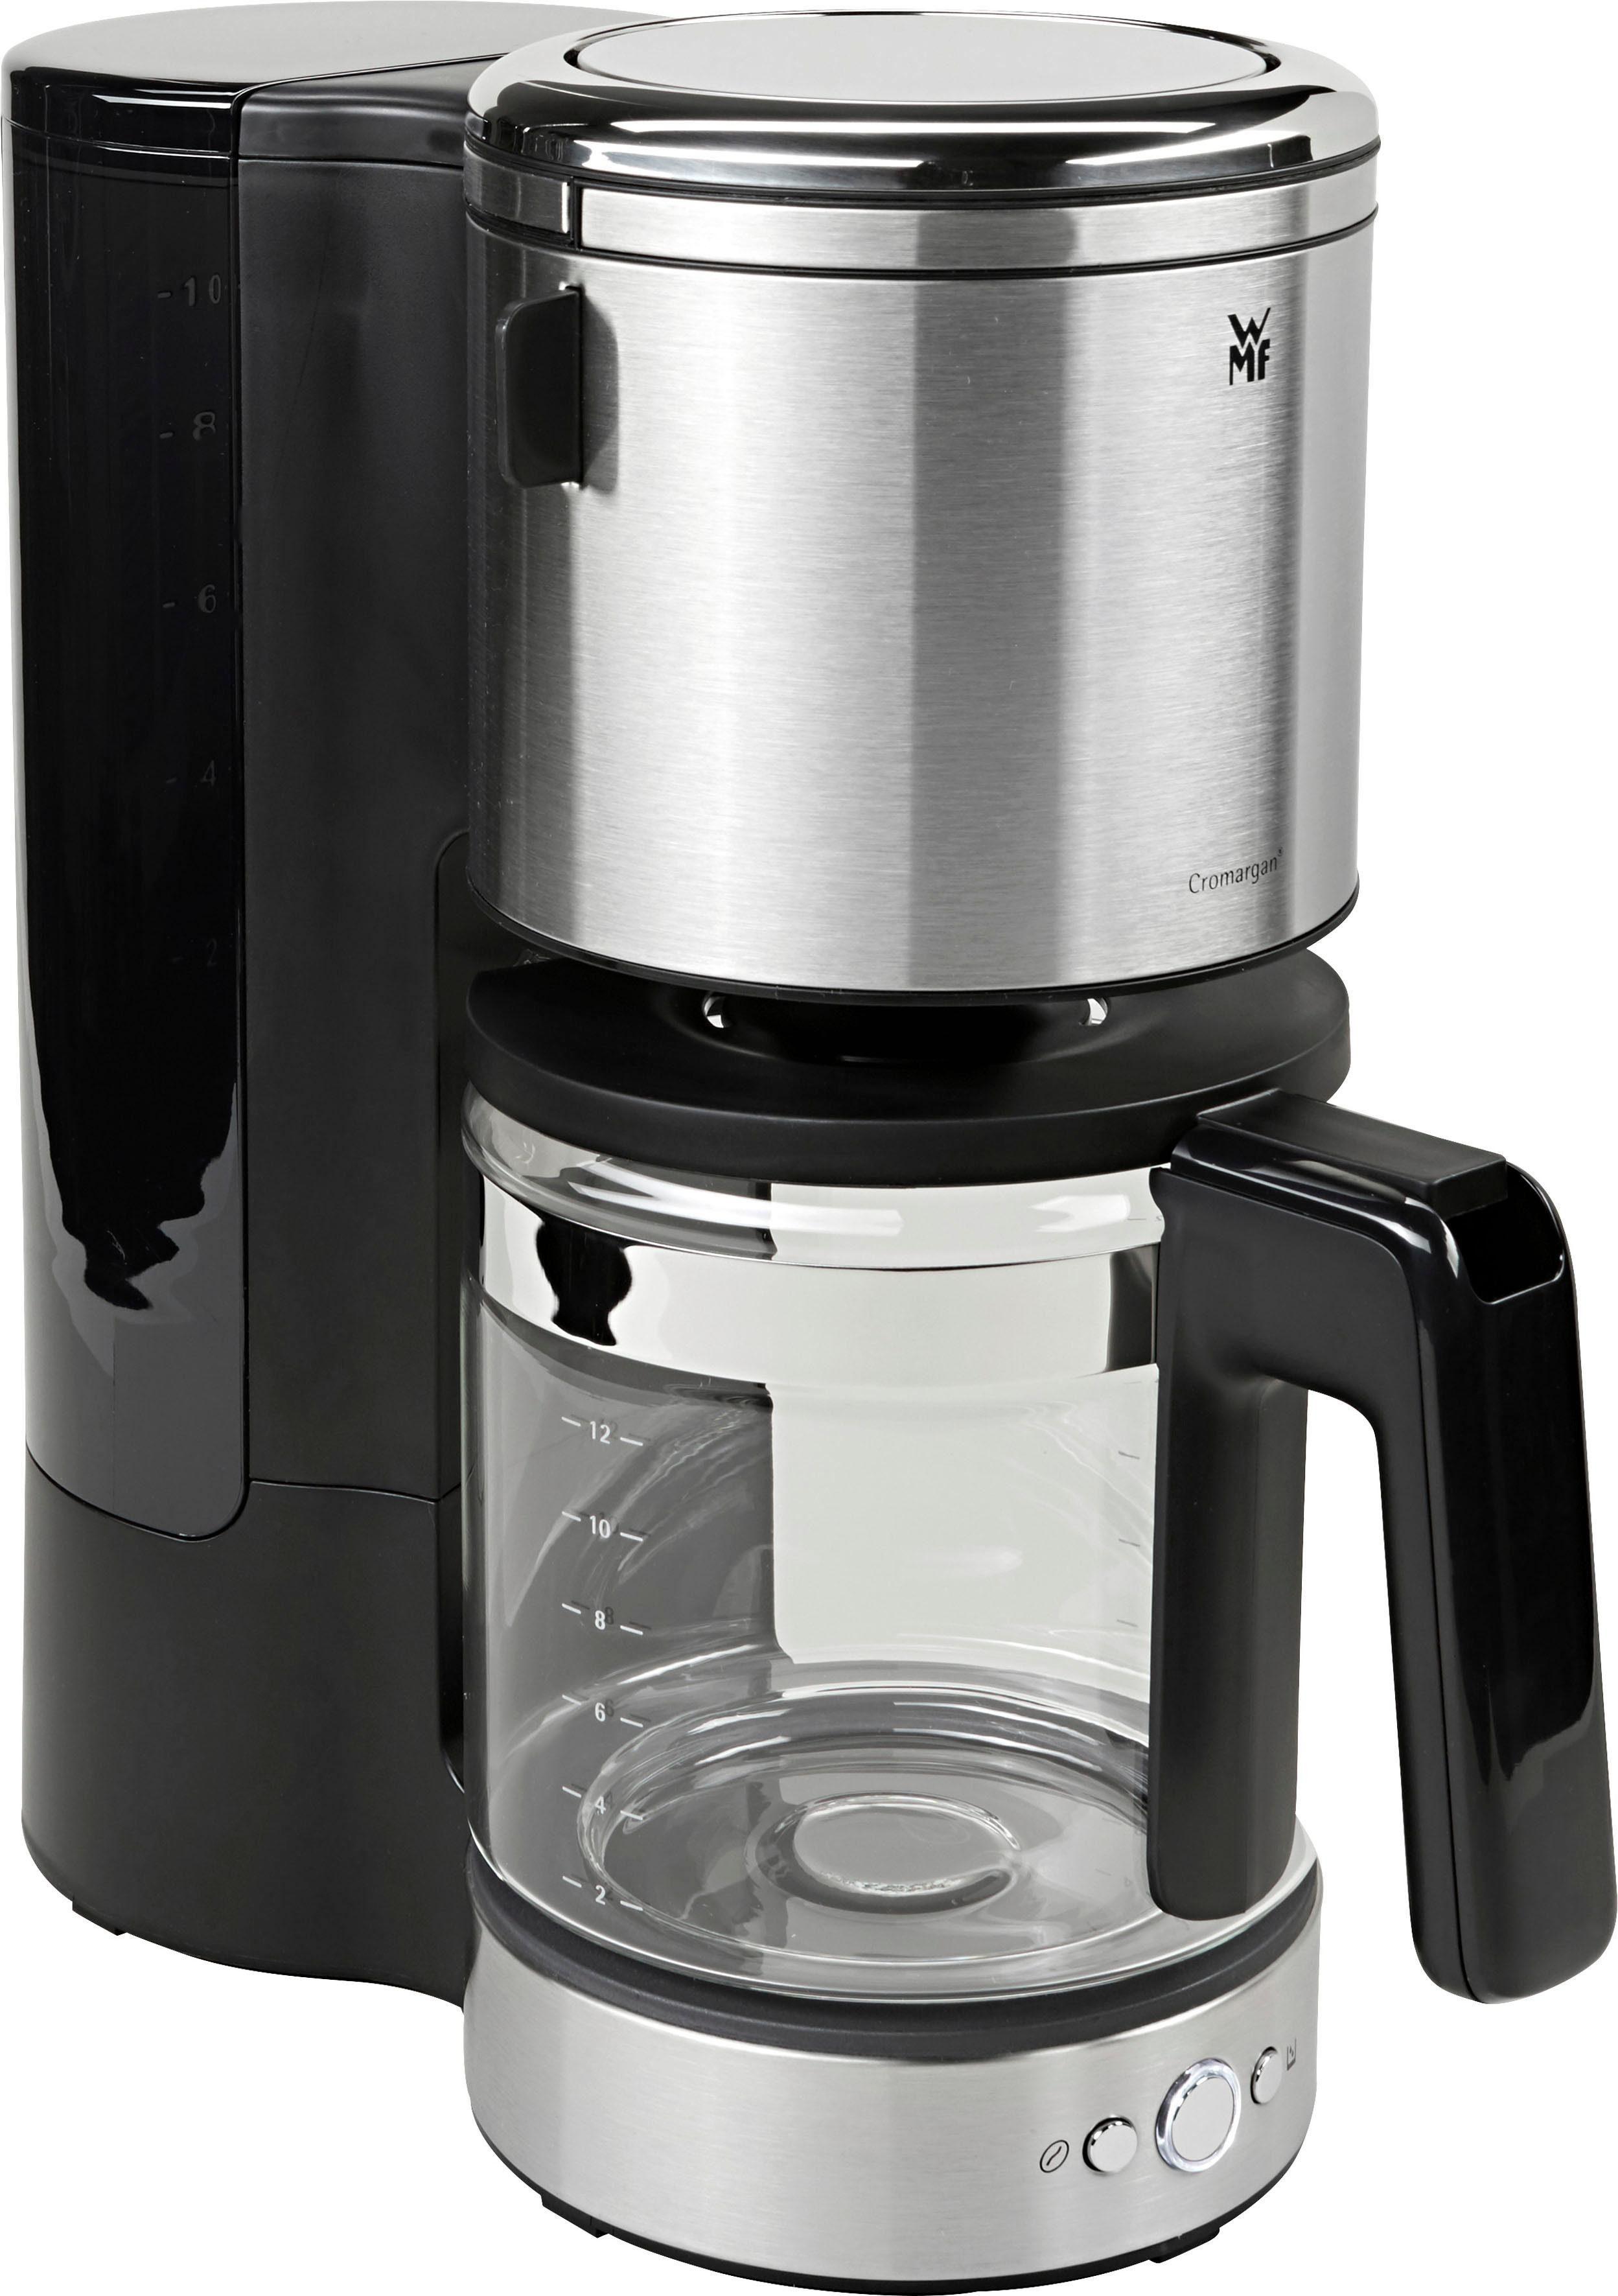 WMF Filterkaffeemaschine LONO, 1,5l Kaffeekanne, Papierfilter, mit Aromaglaskanne